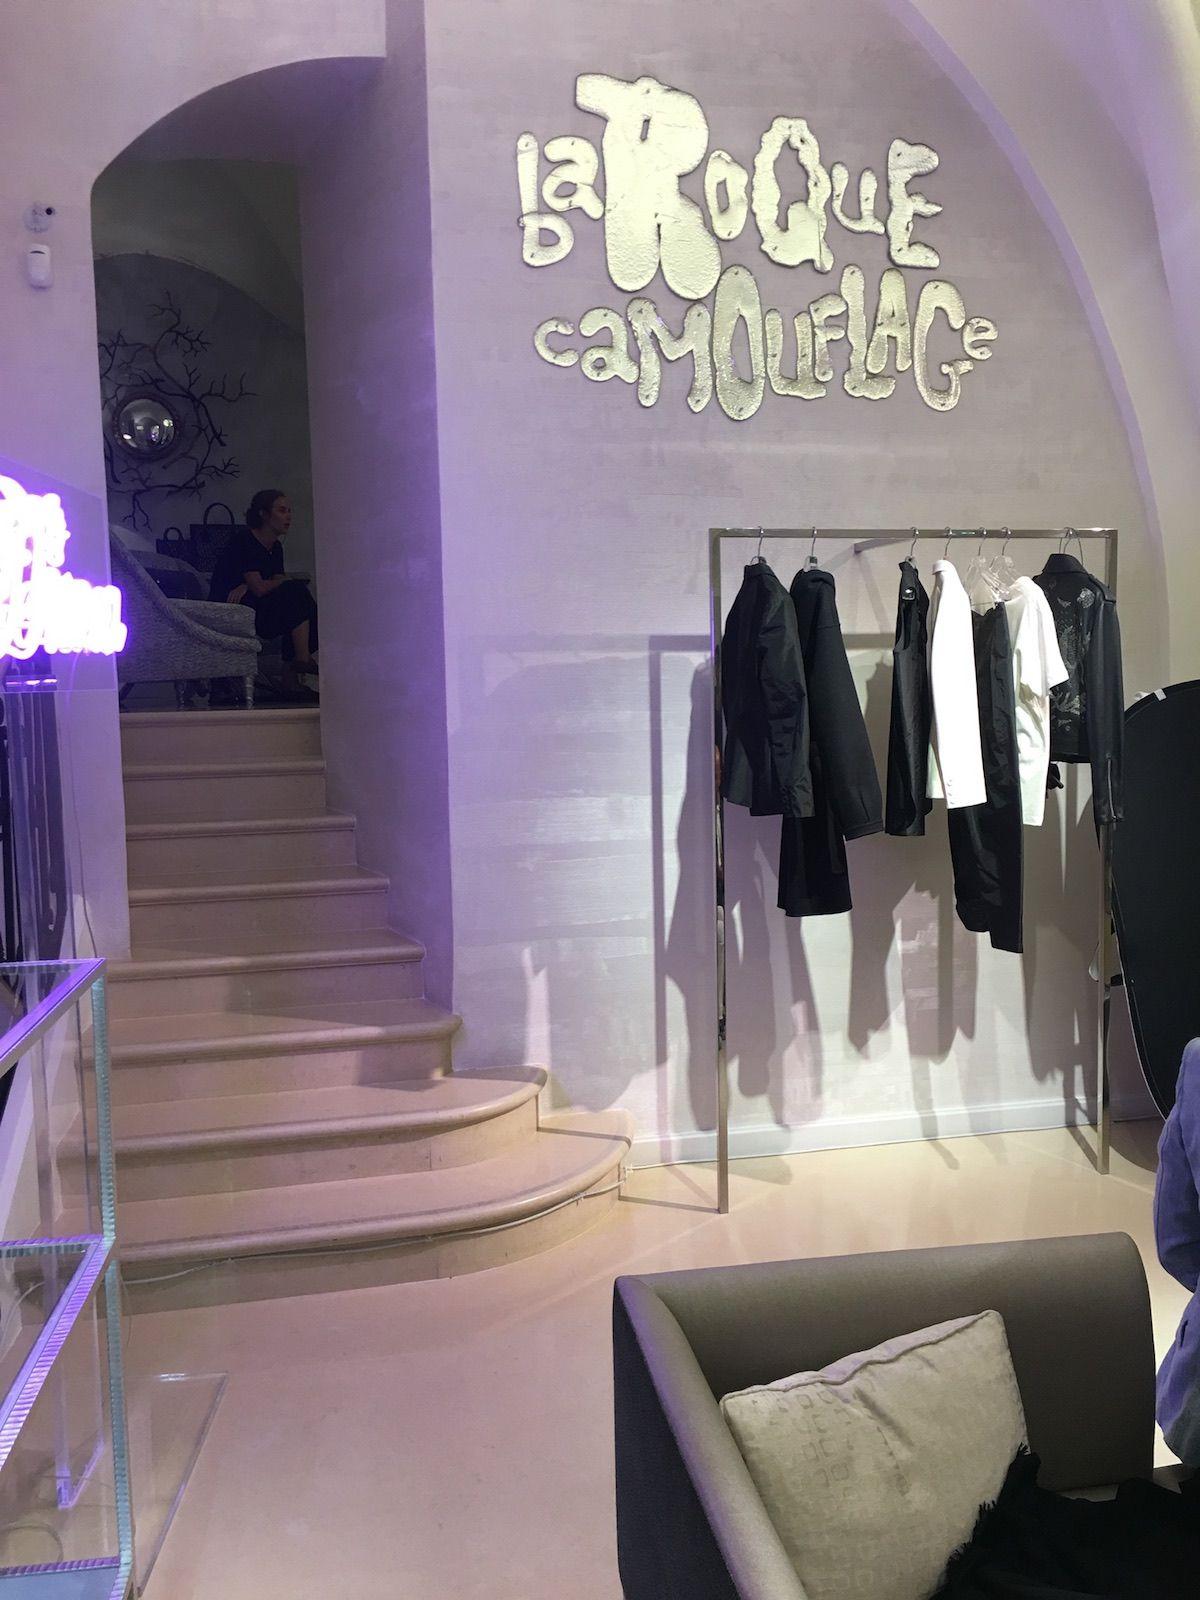 dior, evento, tarots reader, tarots pochette, diorama, Firenze, boutique, boutique Dior, Maria Grazia Chiuri, party, festa, serata, jadior,Diora, décolleté, aura, energia positiva